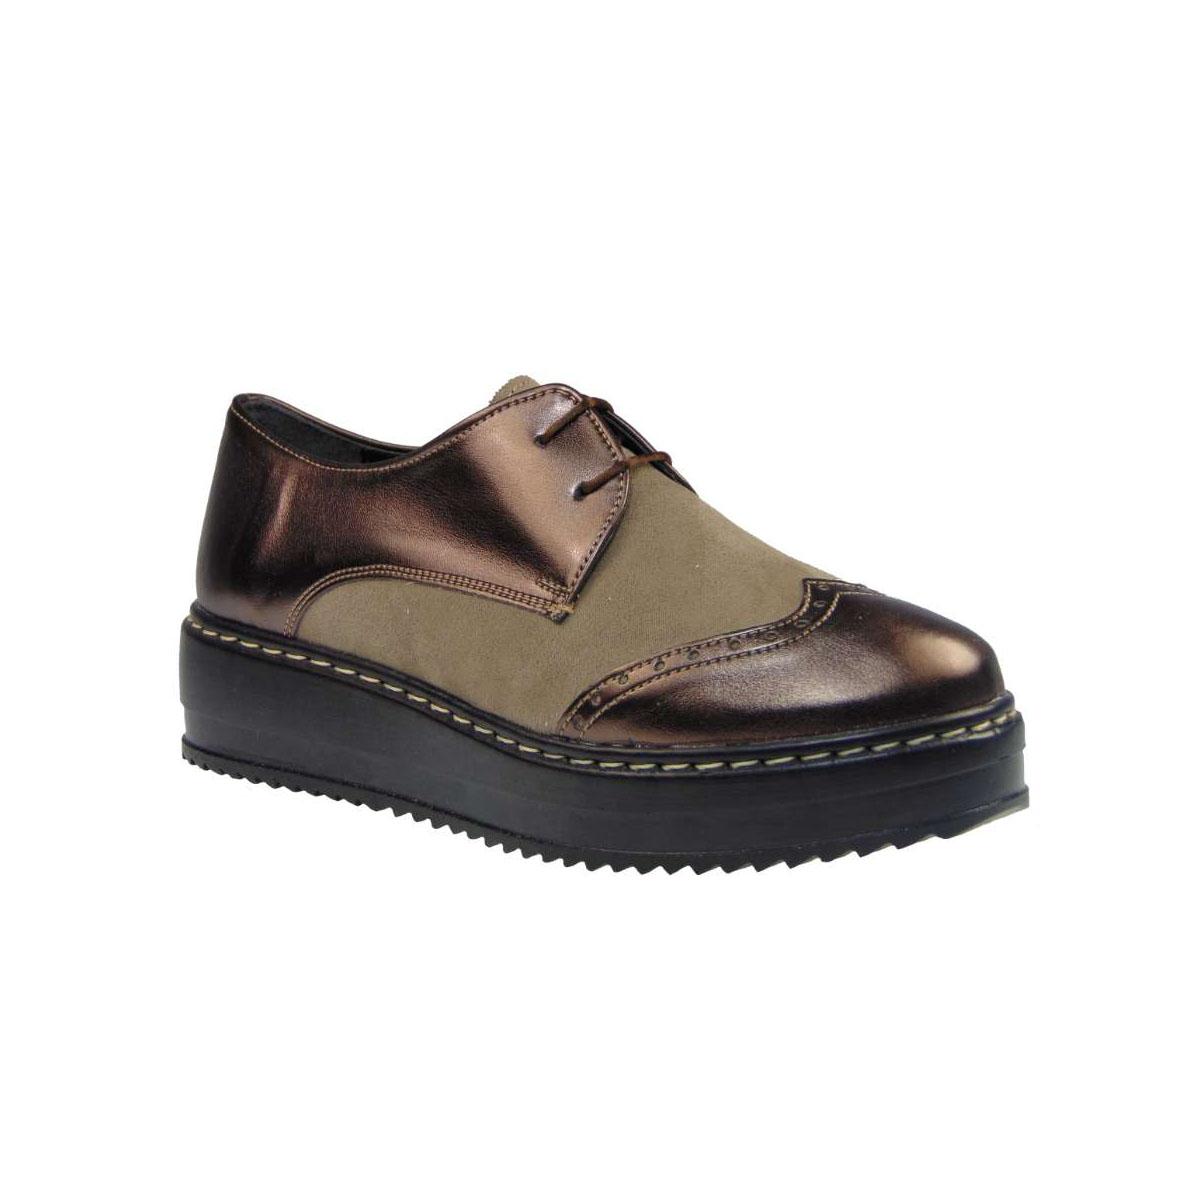 Tsimpolis Shoes 170 Oxford Απο Συνθετικό Δέρμα Πούρο